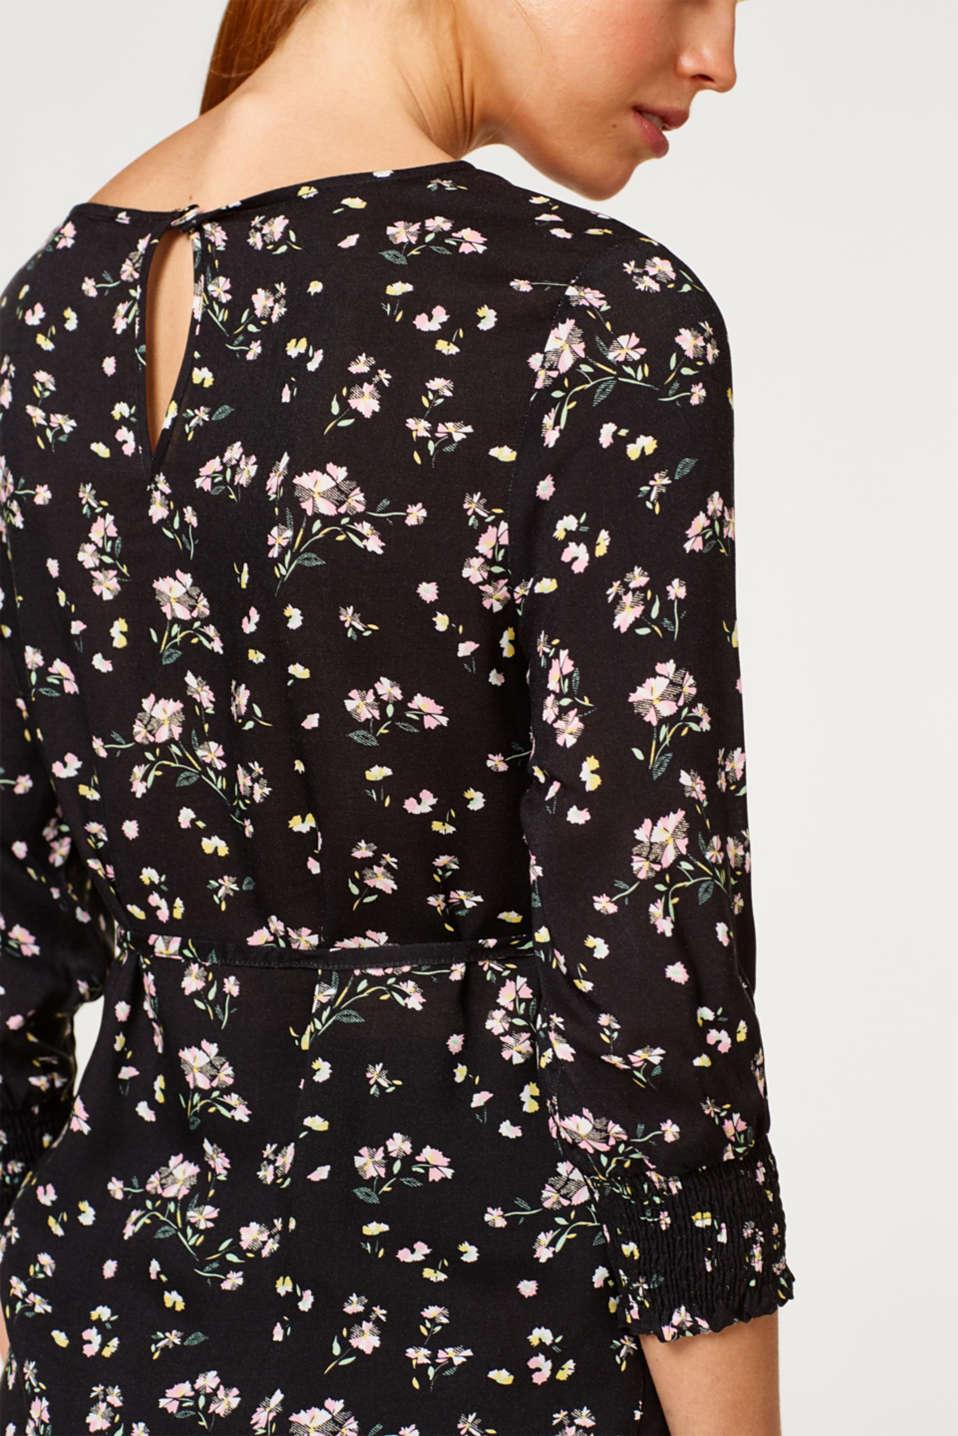 Printed blouse with smocked sleeves, LCBLACK, detail image number 2